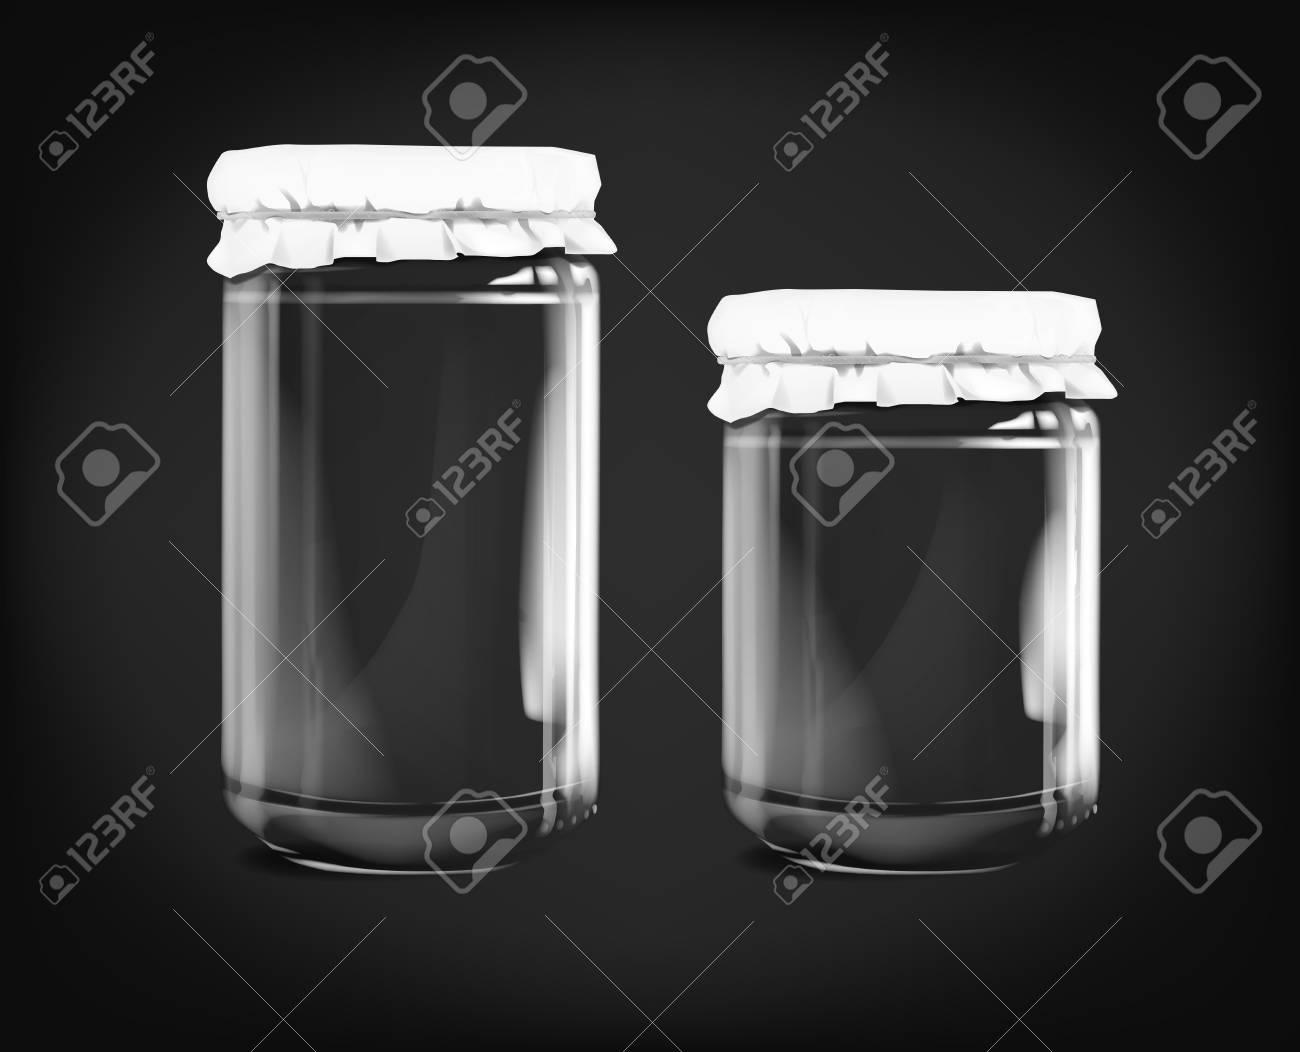 Empty glass jar isolated on dark background. - 125298565